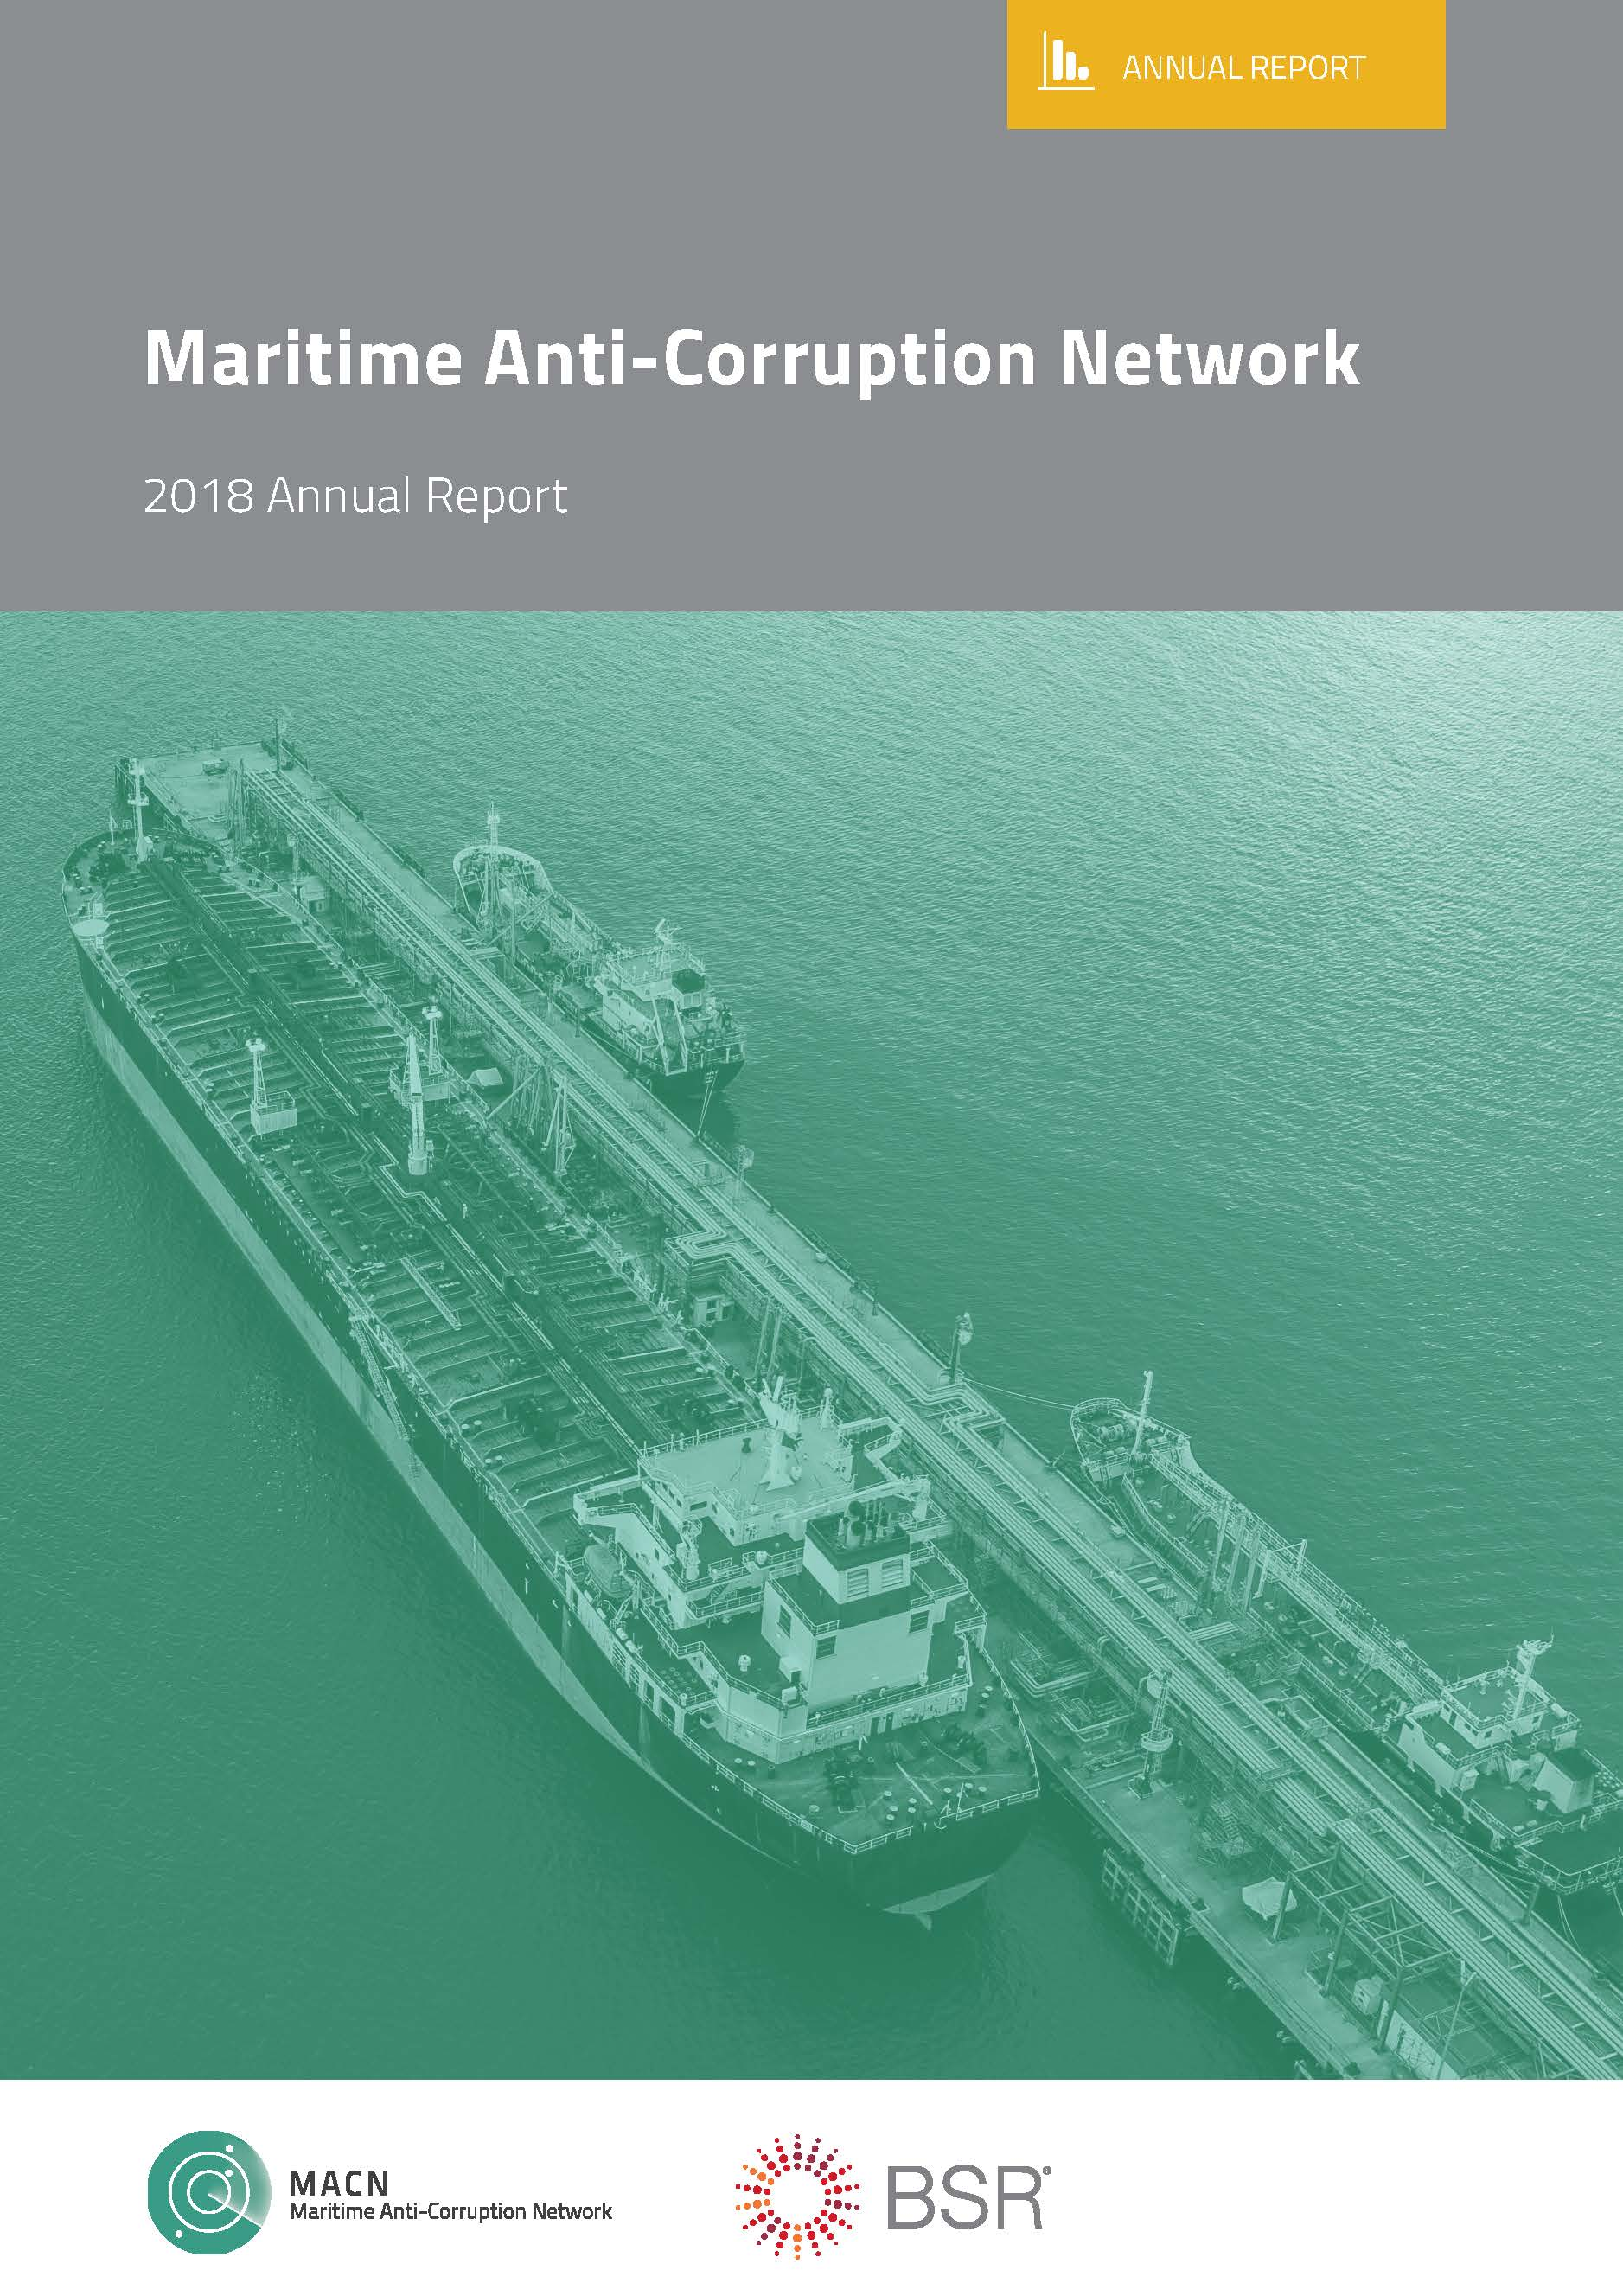 macn-annual-report-2018-cover.jpg